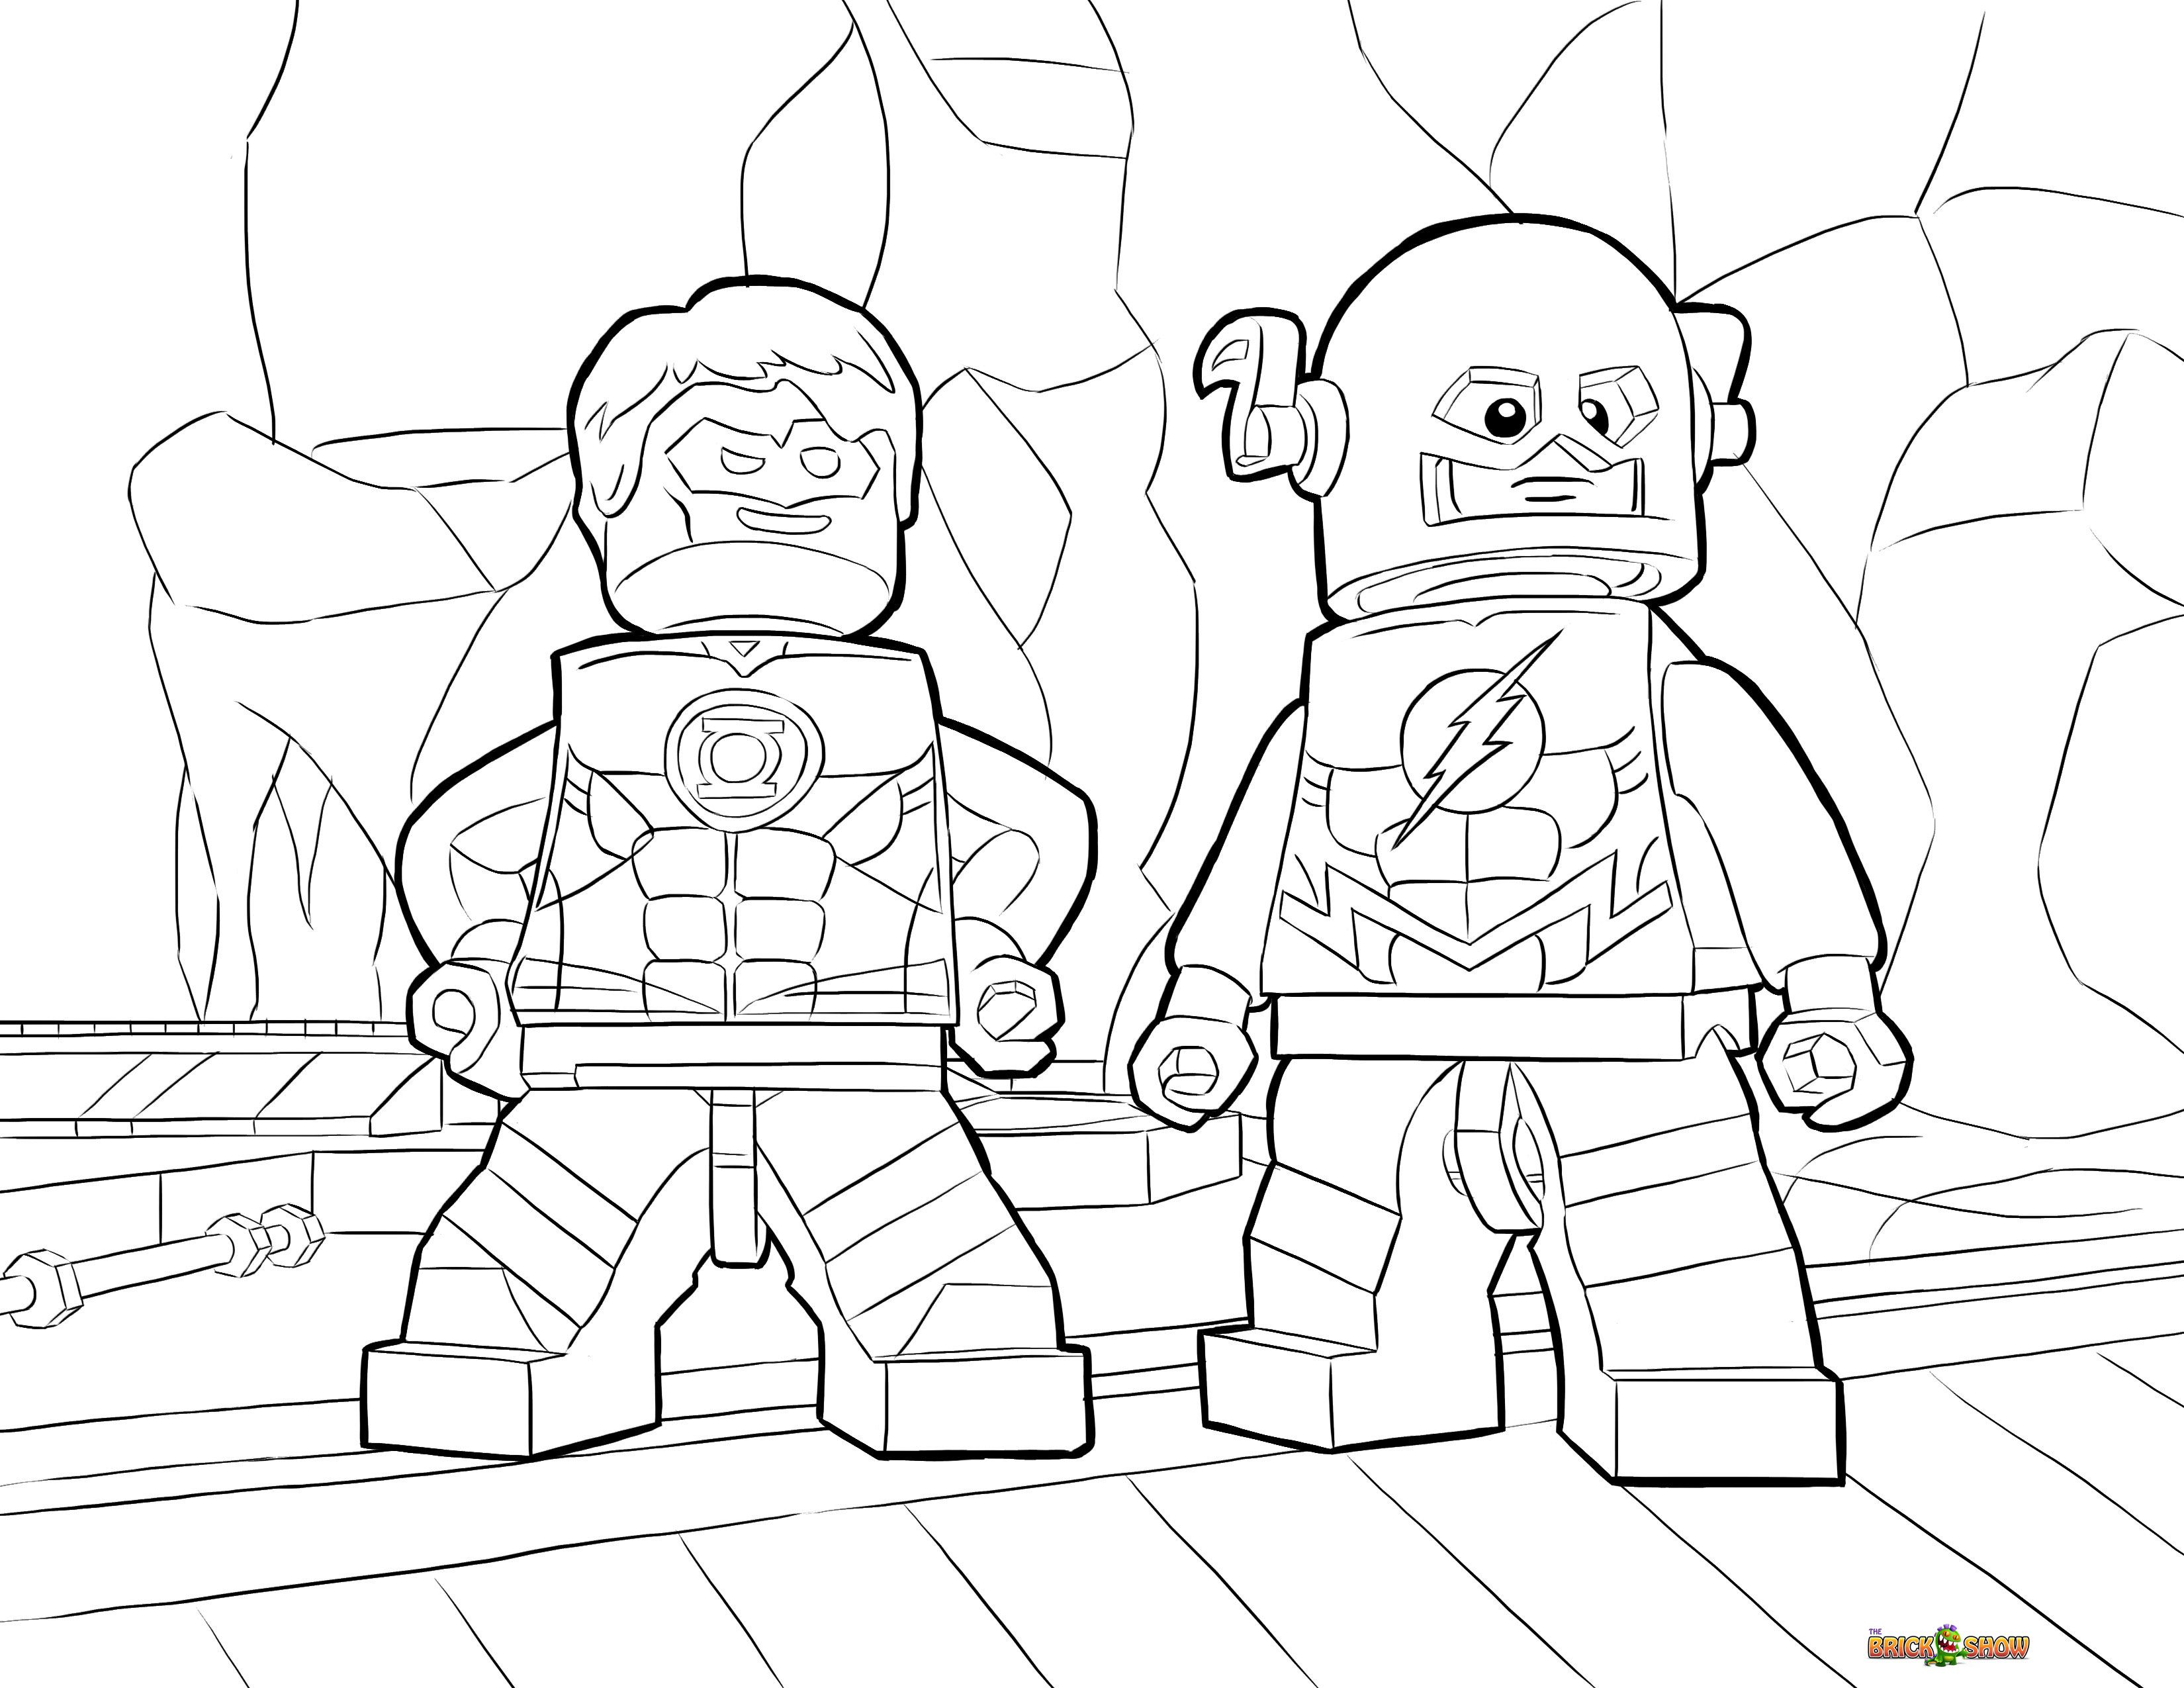 Lego Batman 3 Beyond Gotham Coloring Pages Superhero Coloring